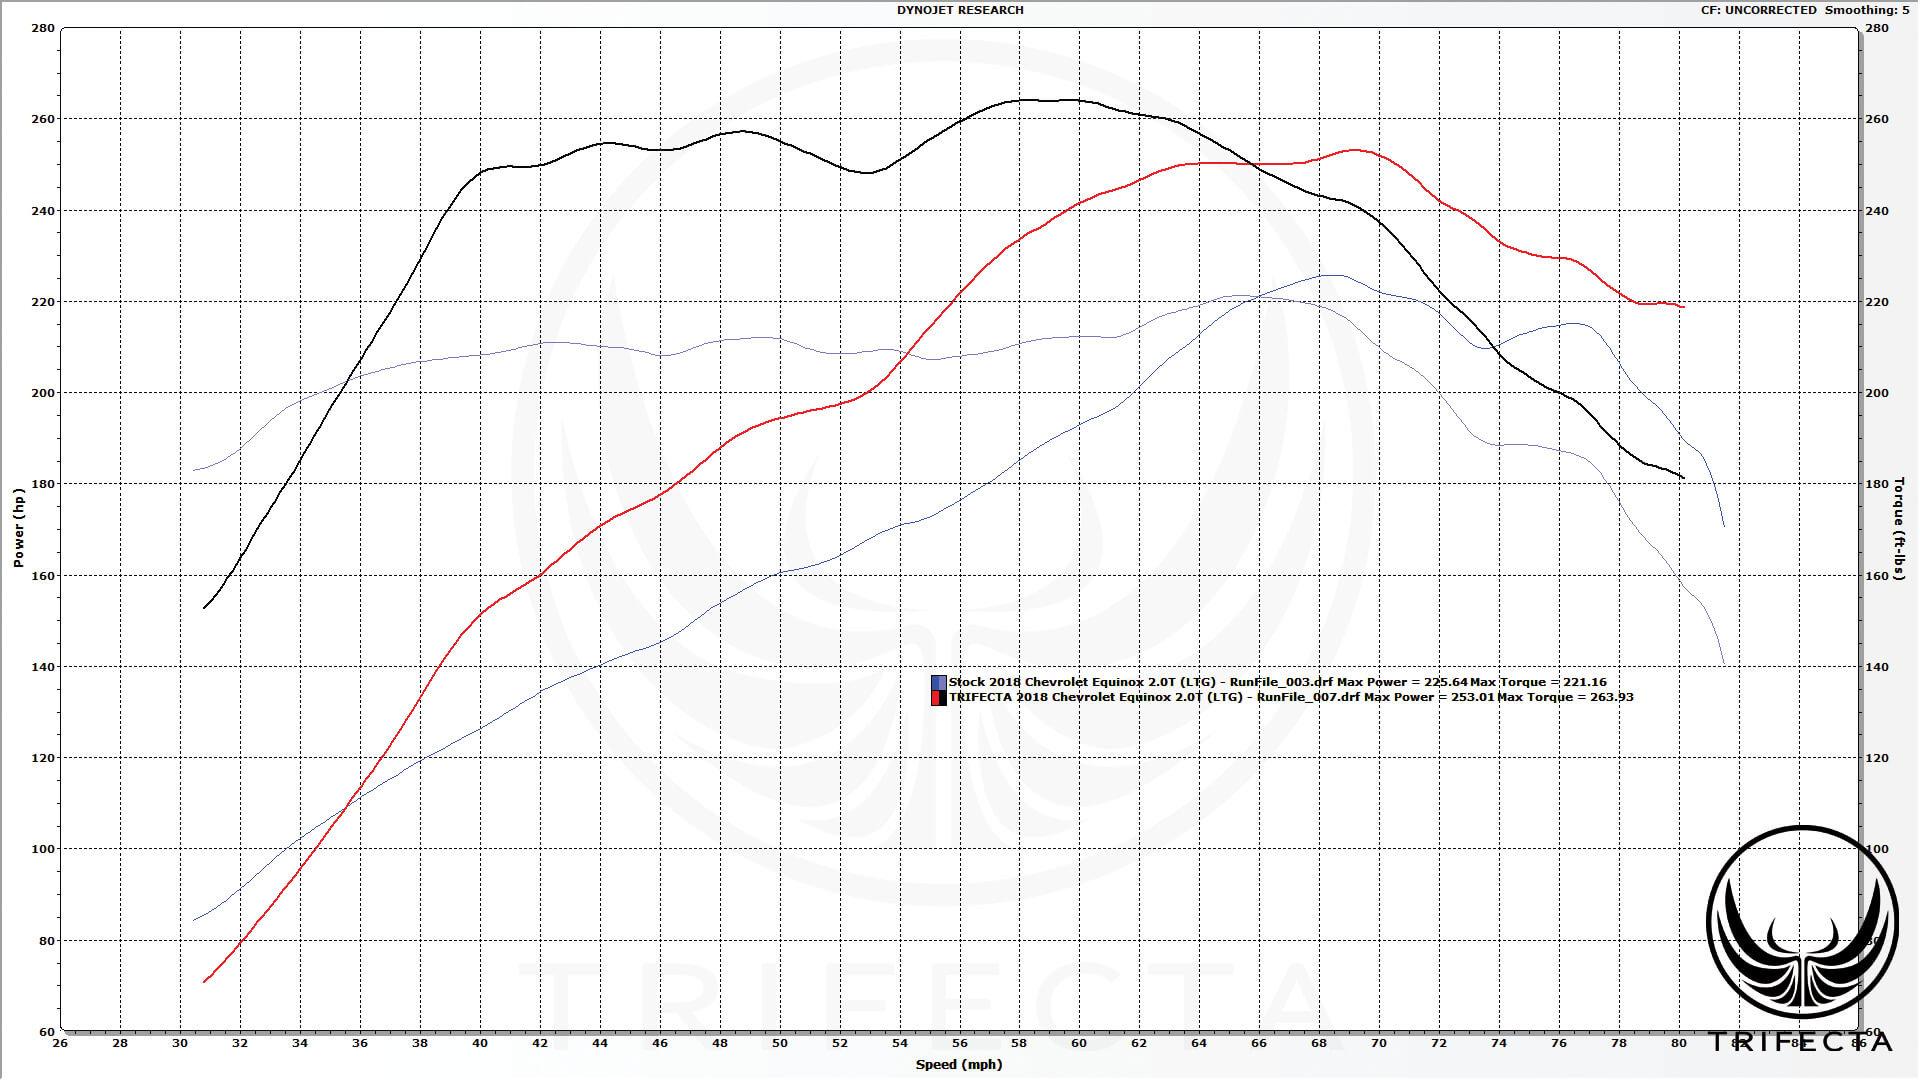 Product Review: 2018--2020 GMC Terrain - 2.0L Turbo - Advantage